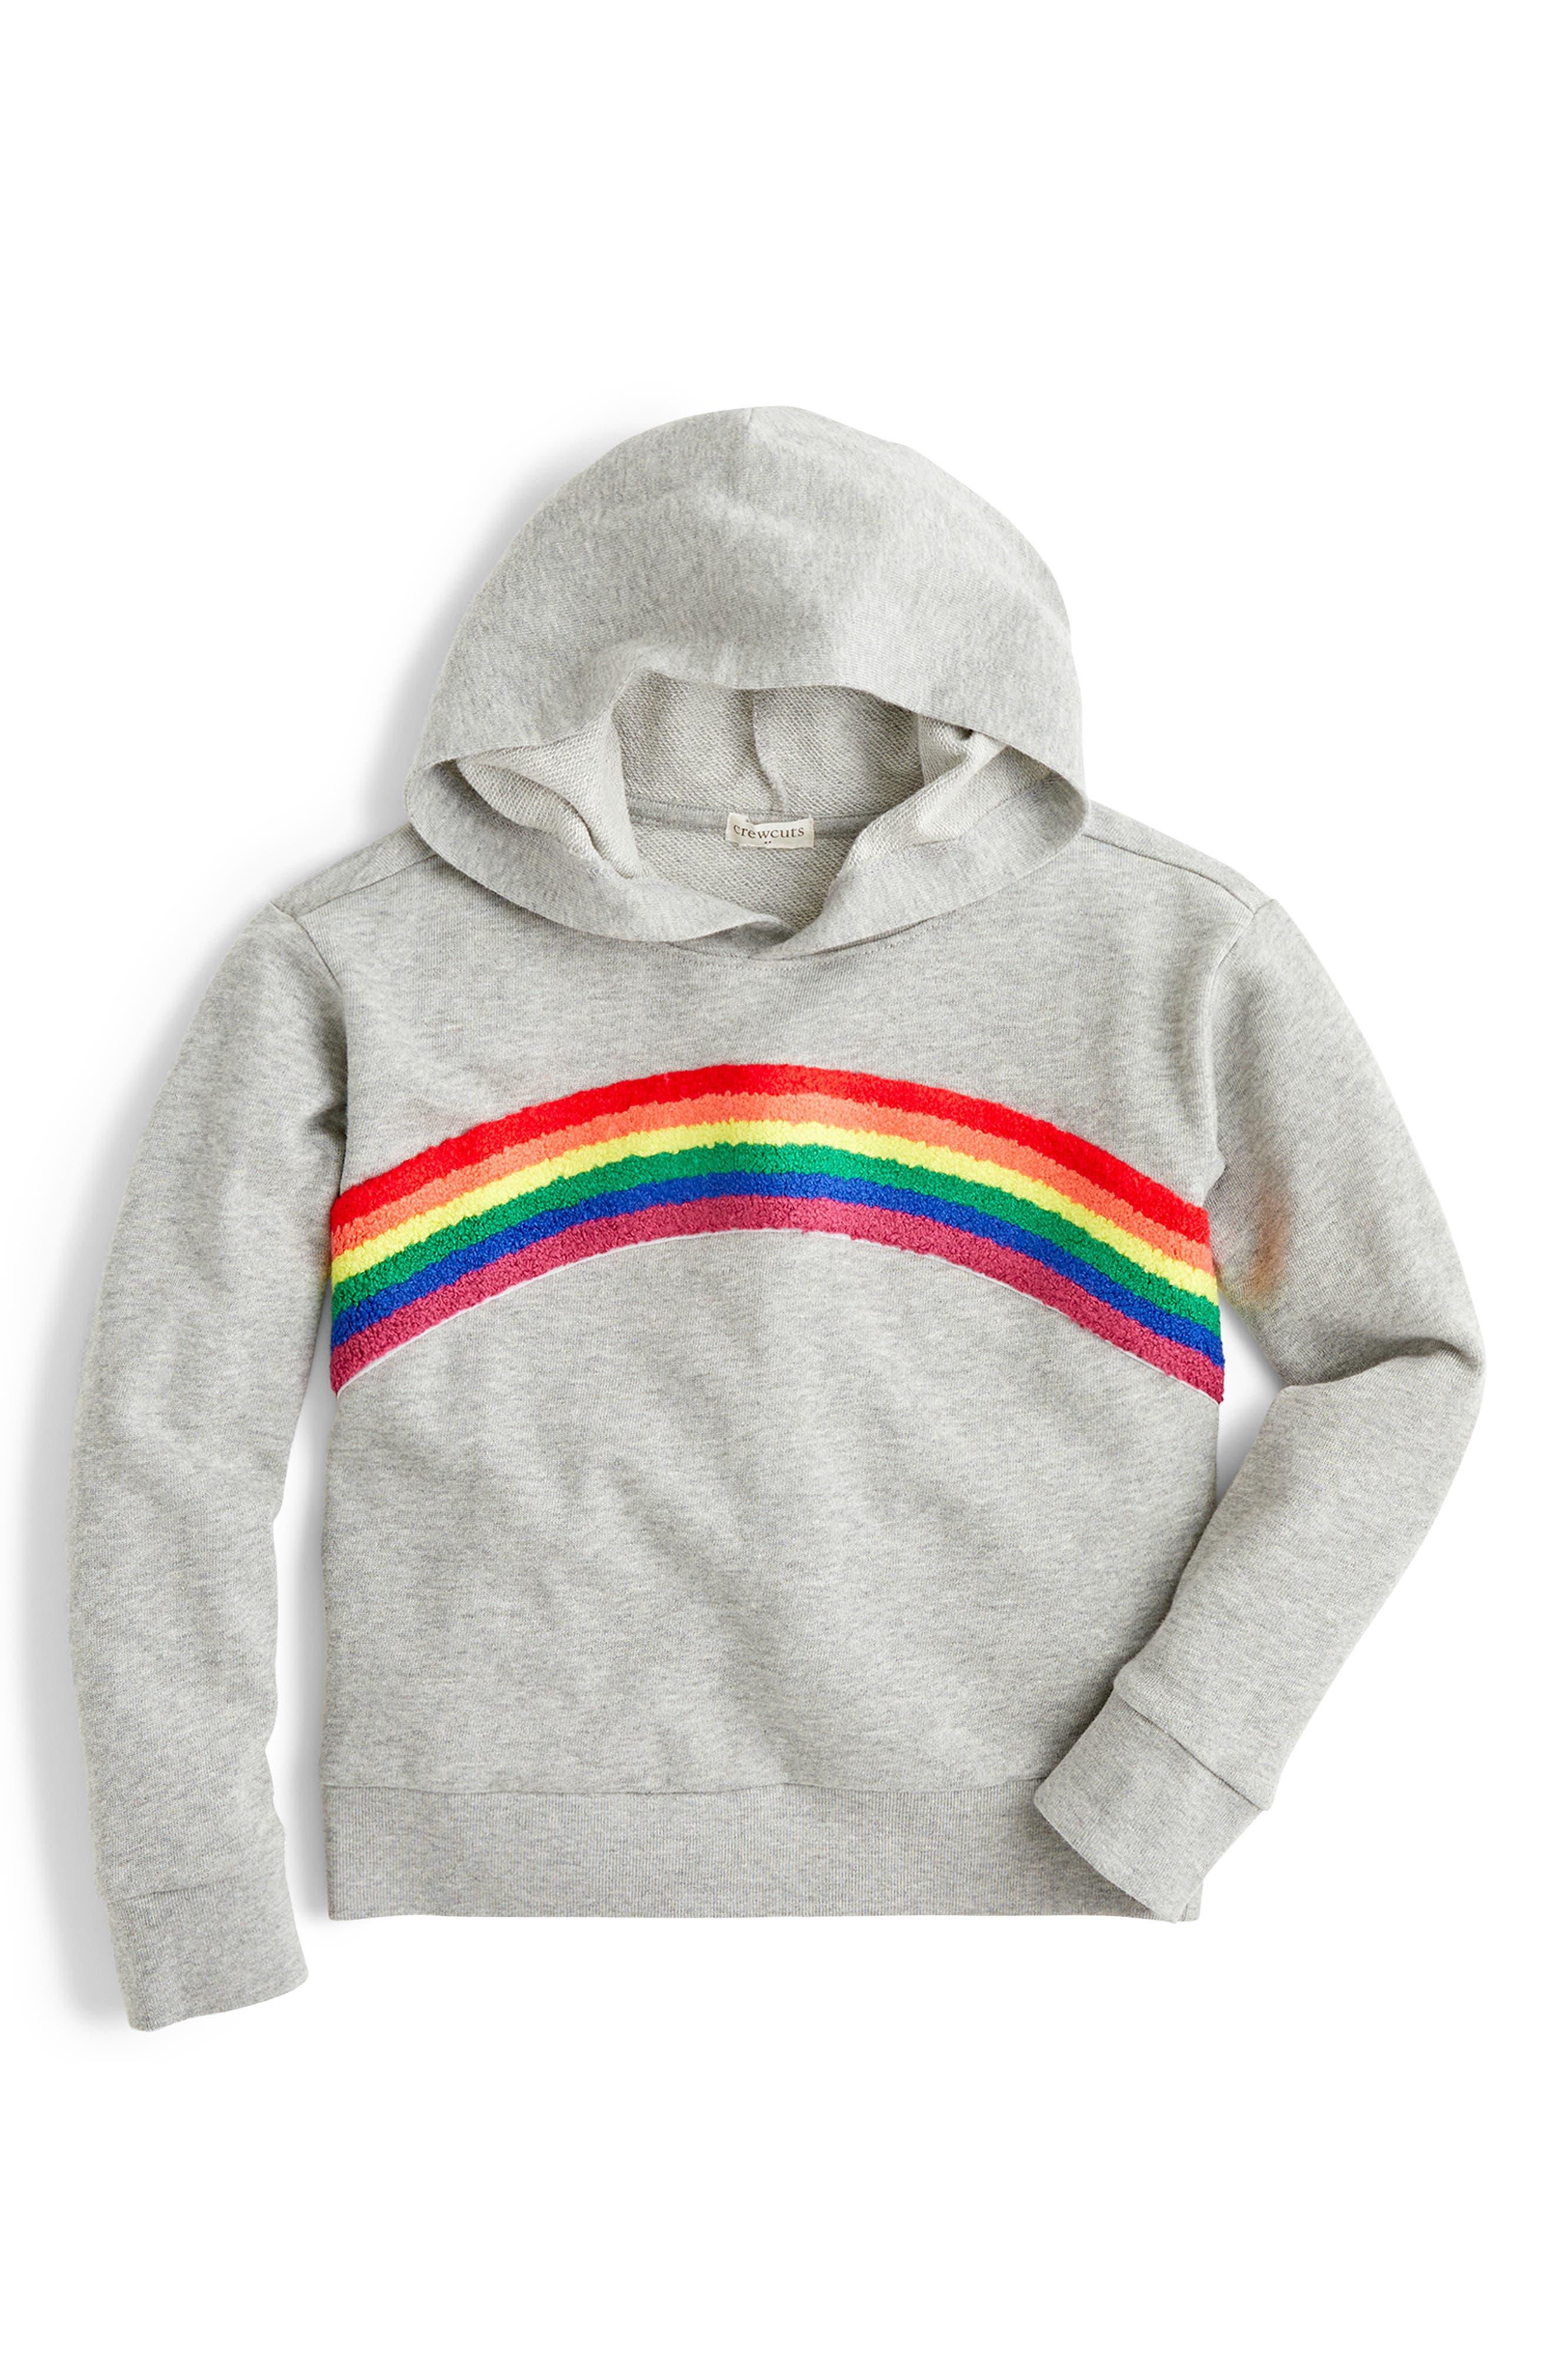 Toddler Girls Crewcuts By Jcrew Rainbow Hoodie Size 2T  Grey